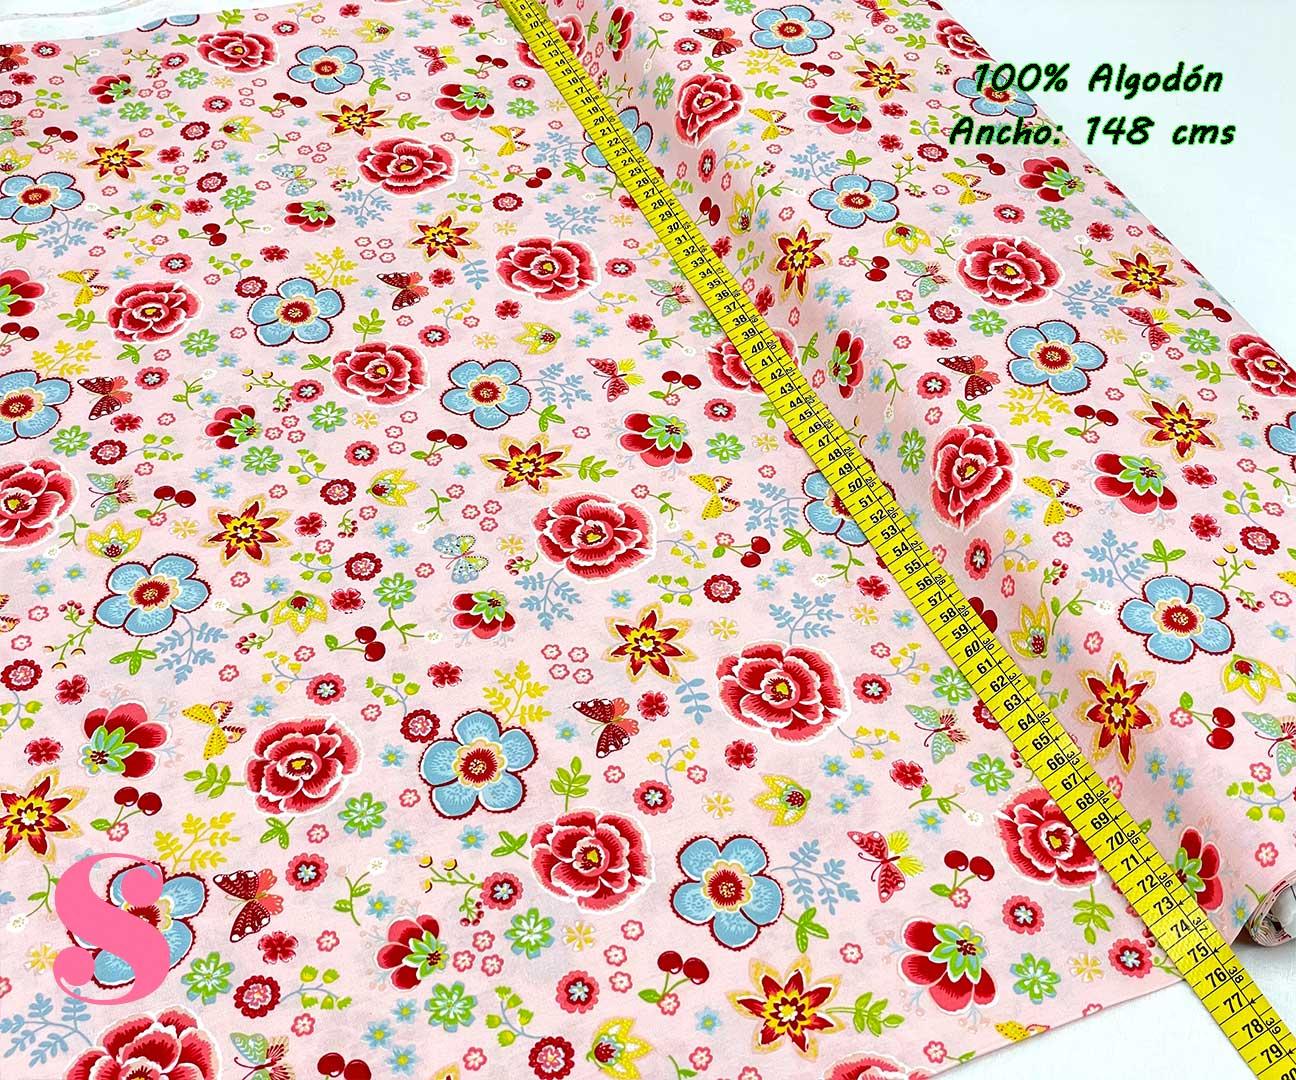 73-tela-estampada-flores,telas-dibujos-primaverales,telas-infantiles,tejidos-infantiles,Tejido Estampado Happy Flowers fondo Rosa